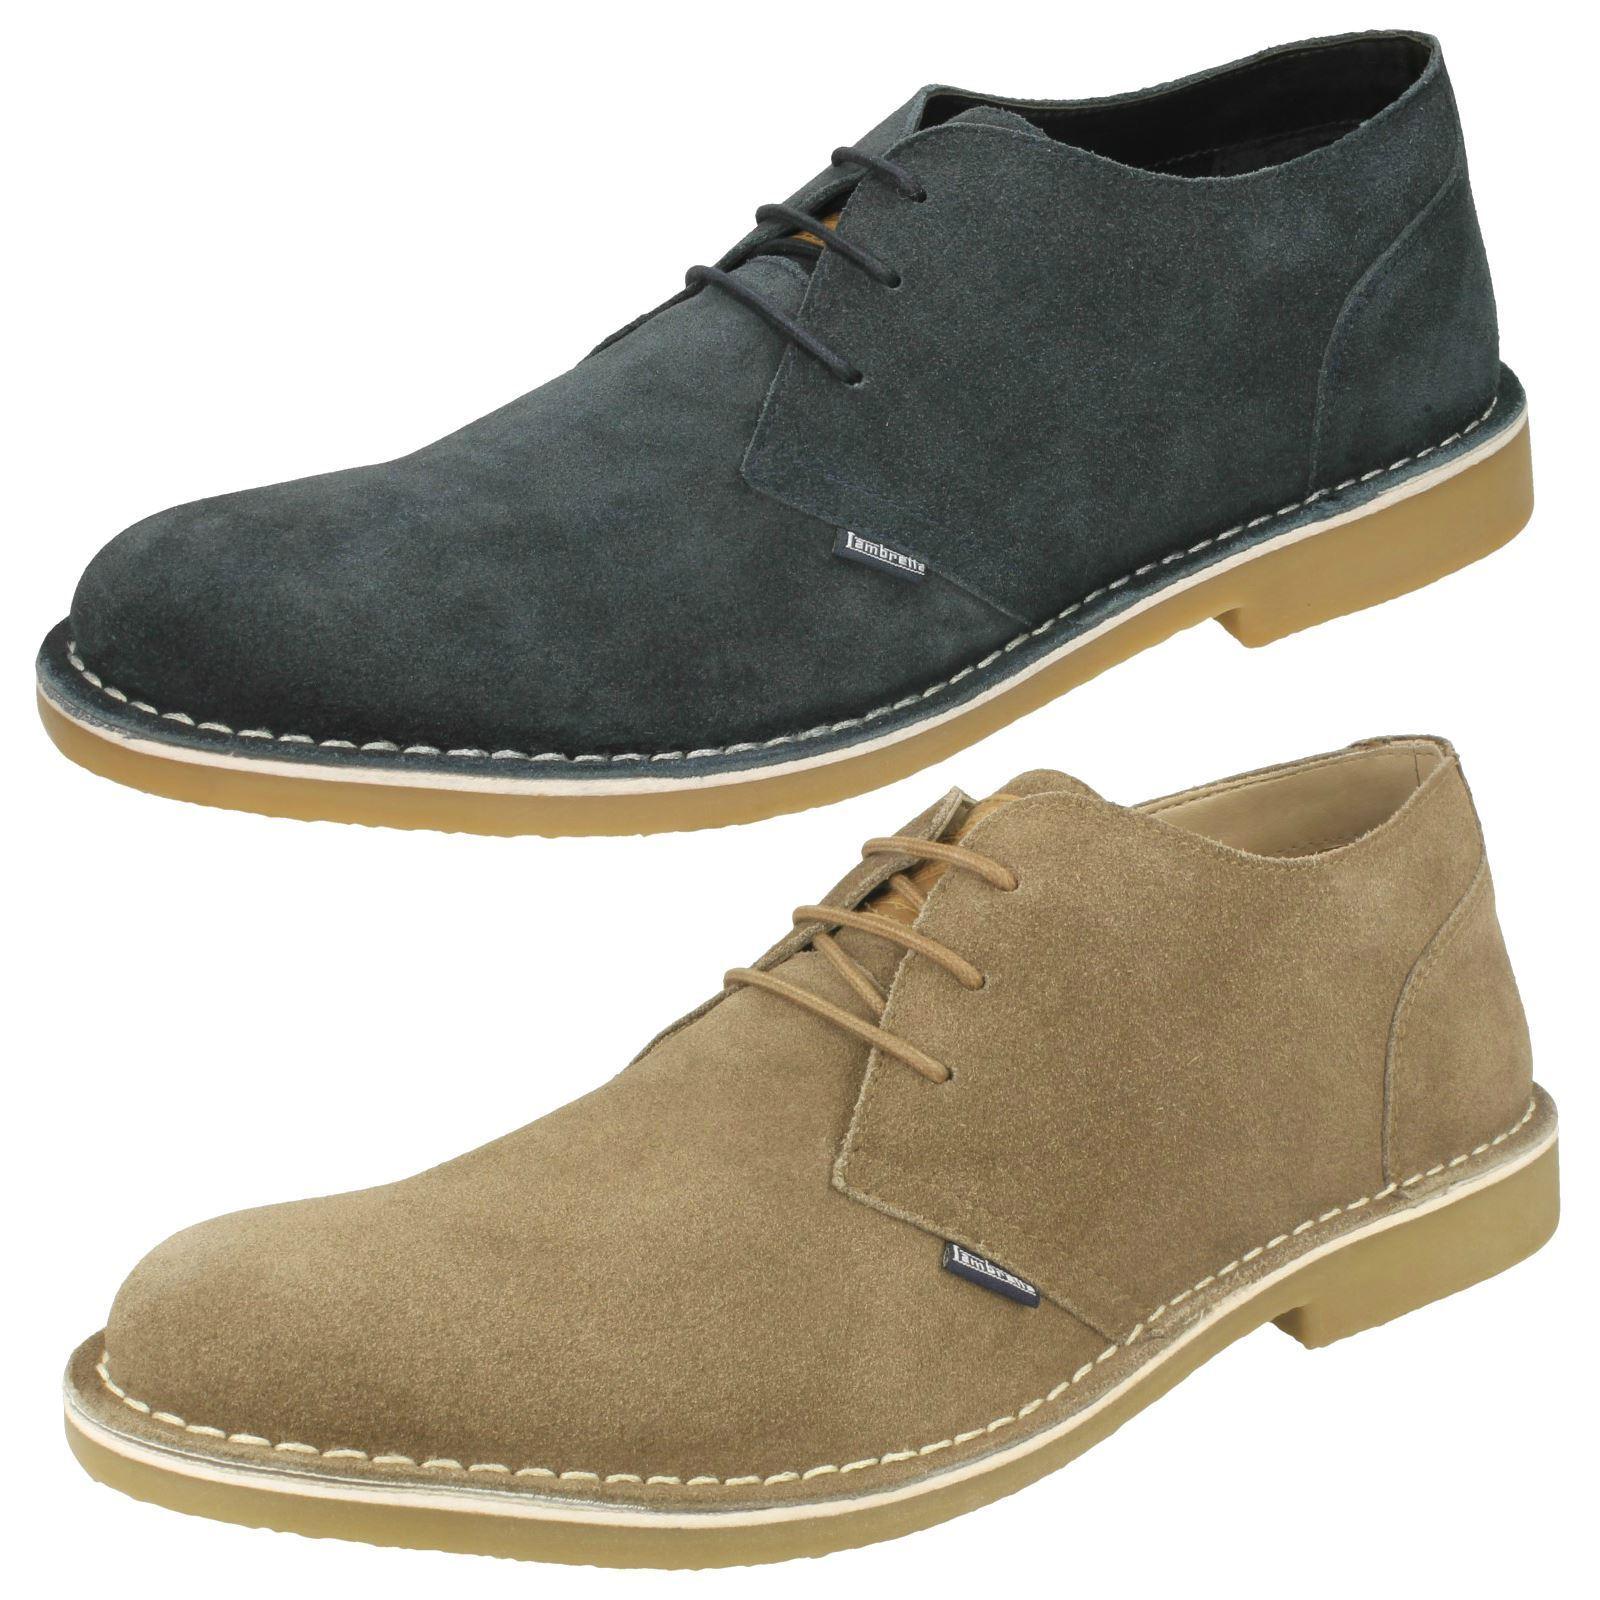 Mens Lambretta Stylish Smart Lace Up shoes Soho